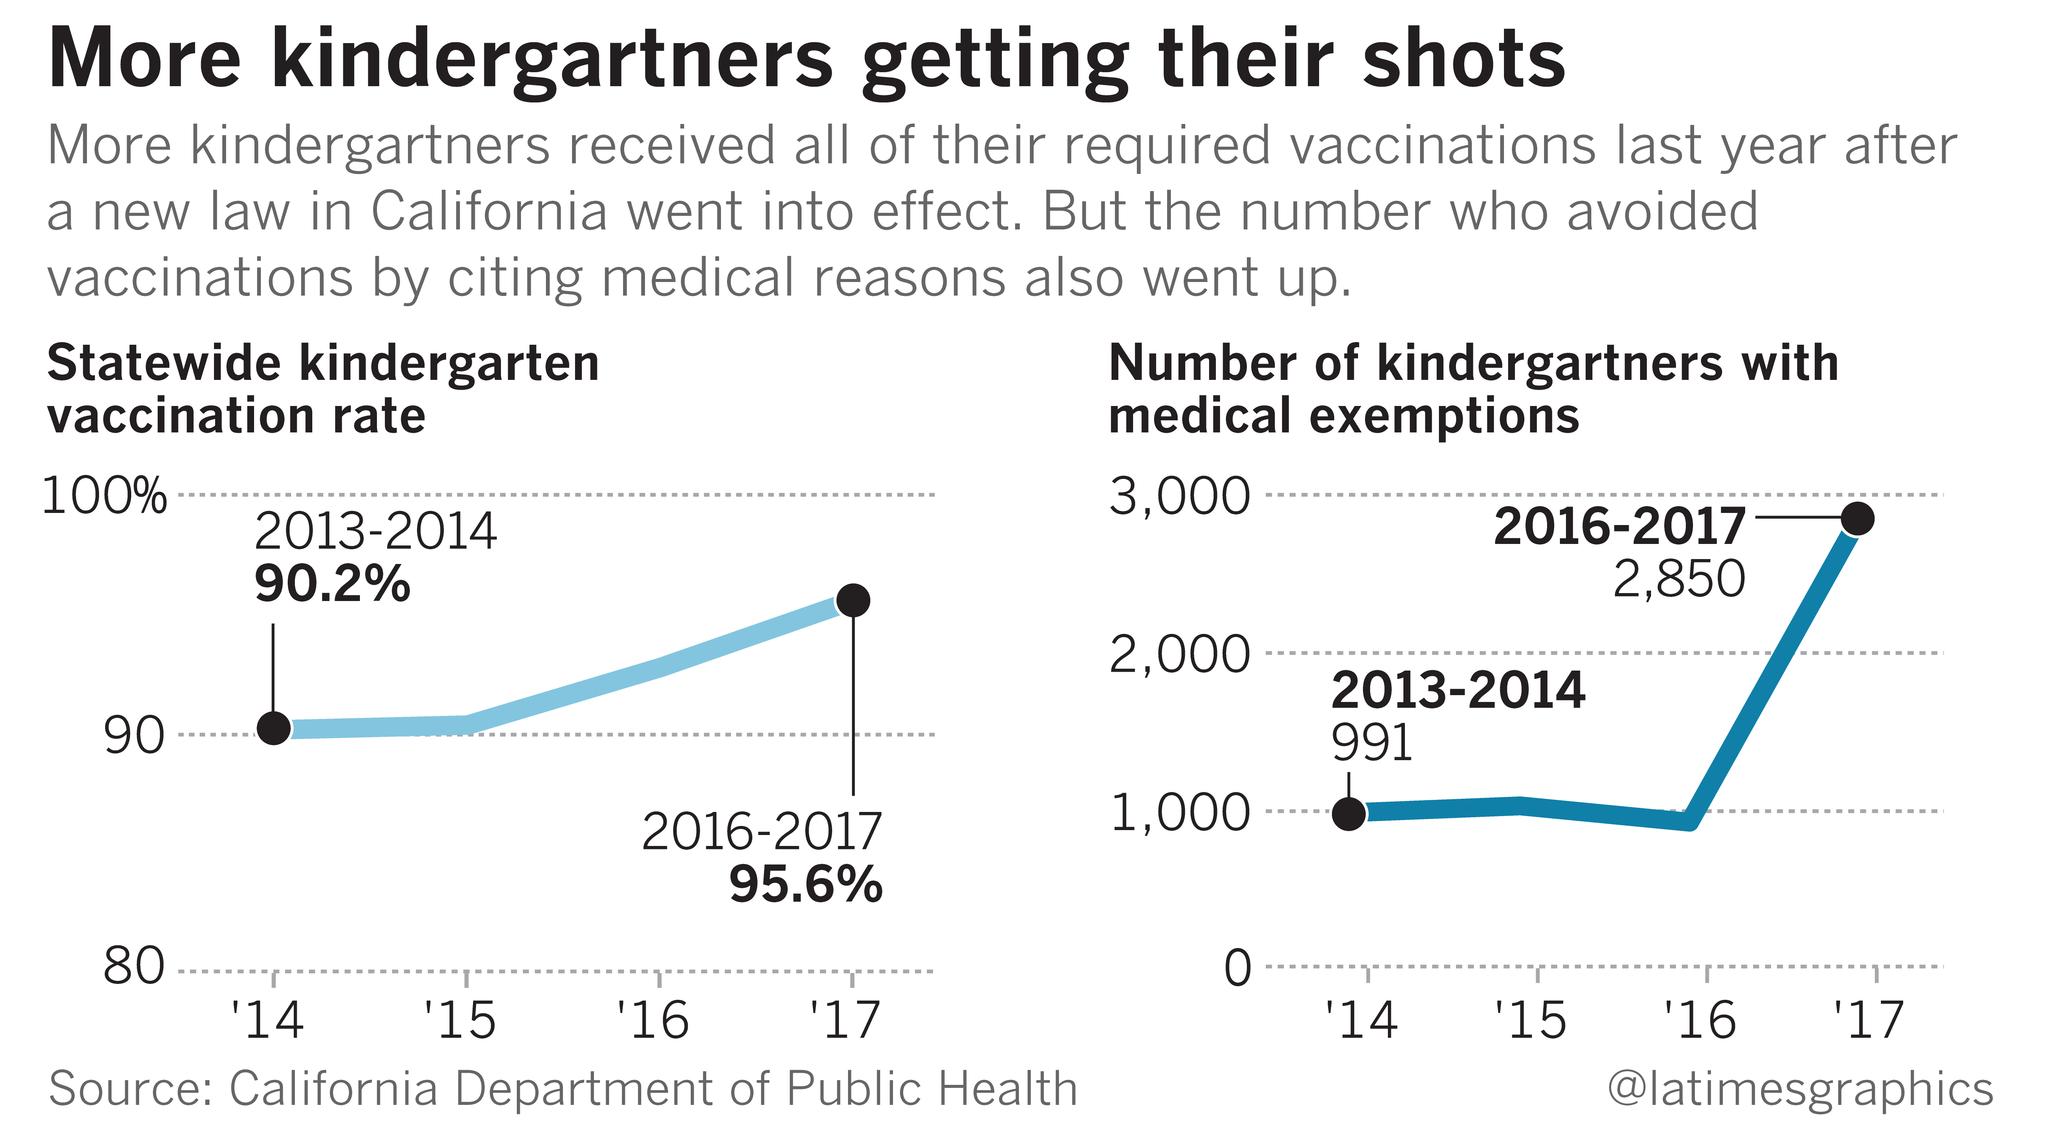 Despite California's strict new law, hundreds of schools